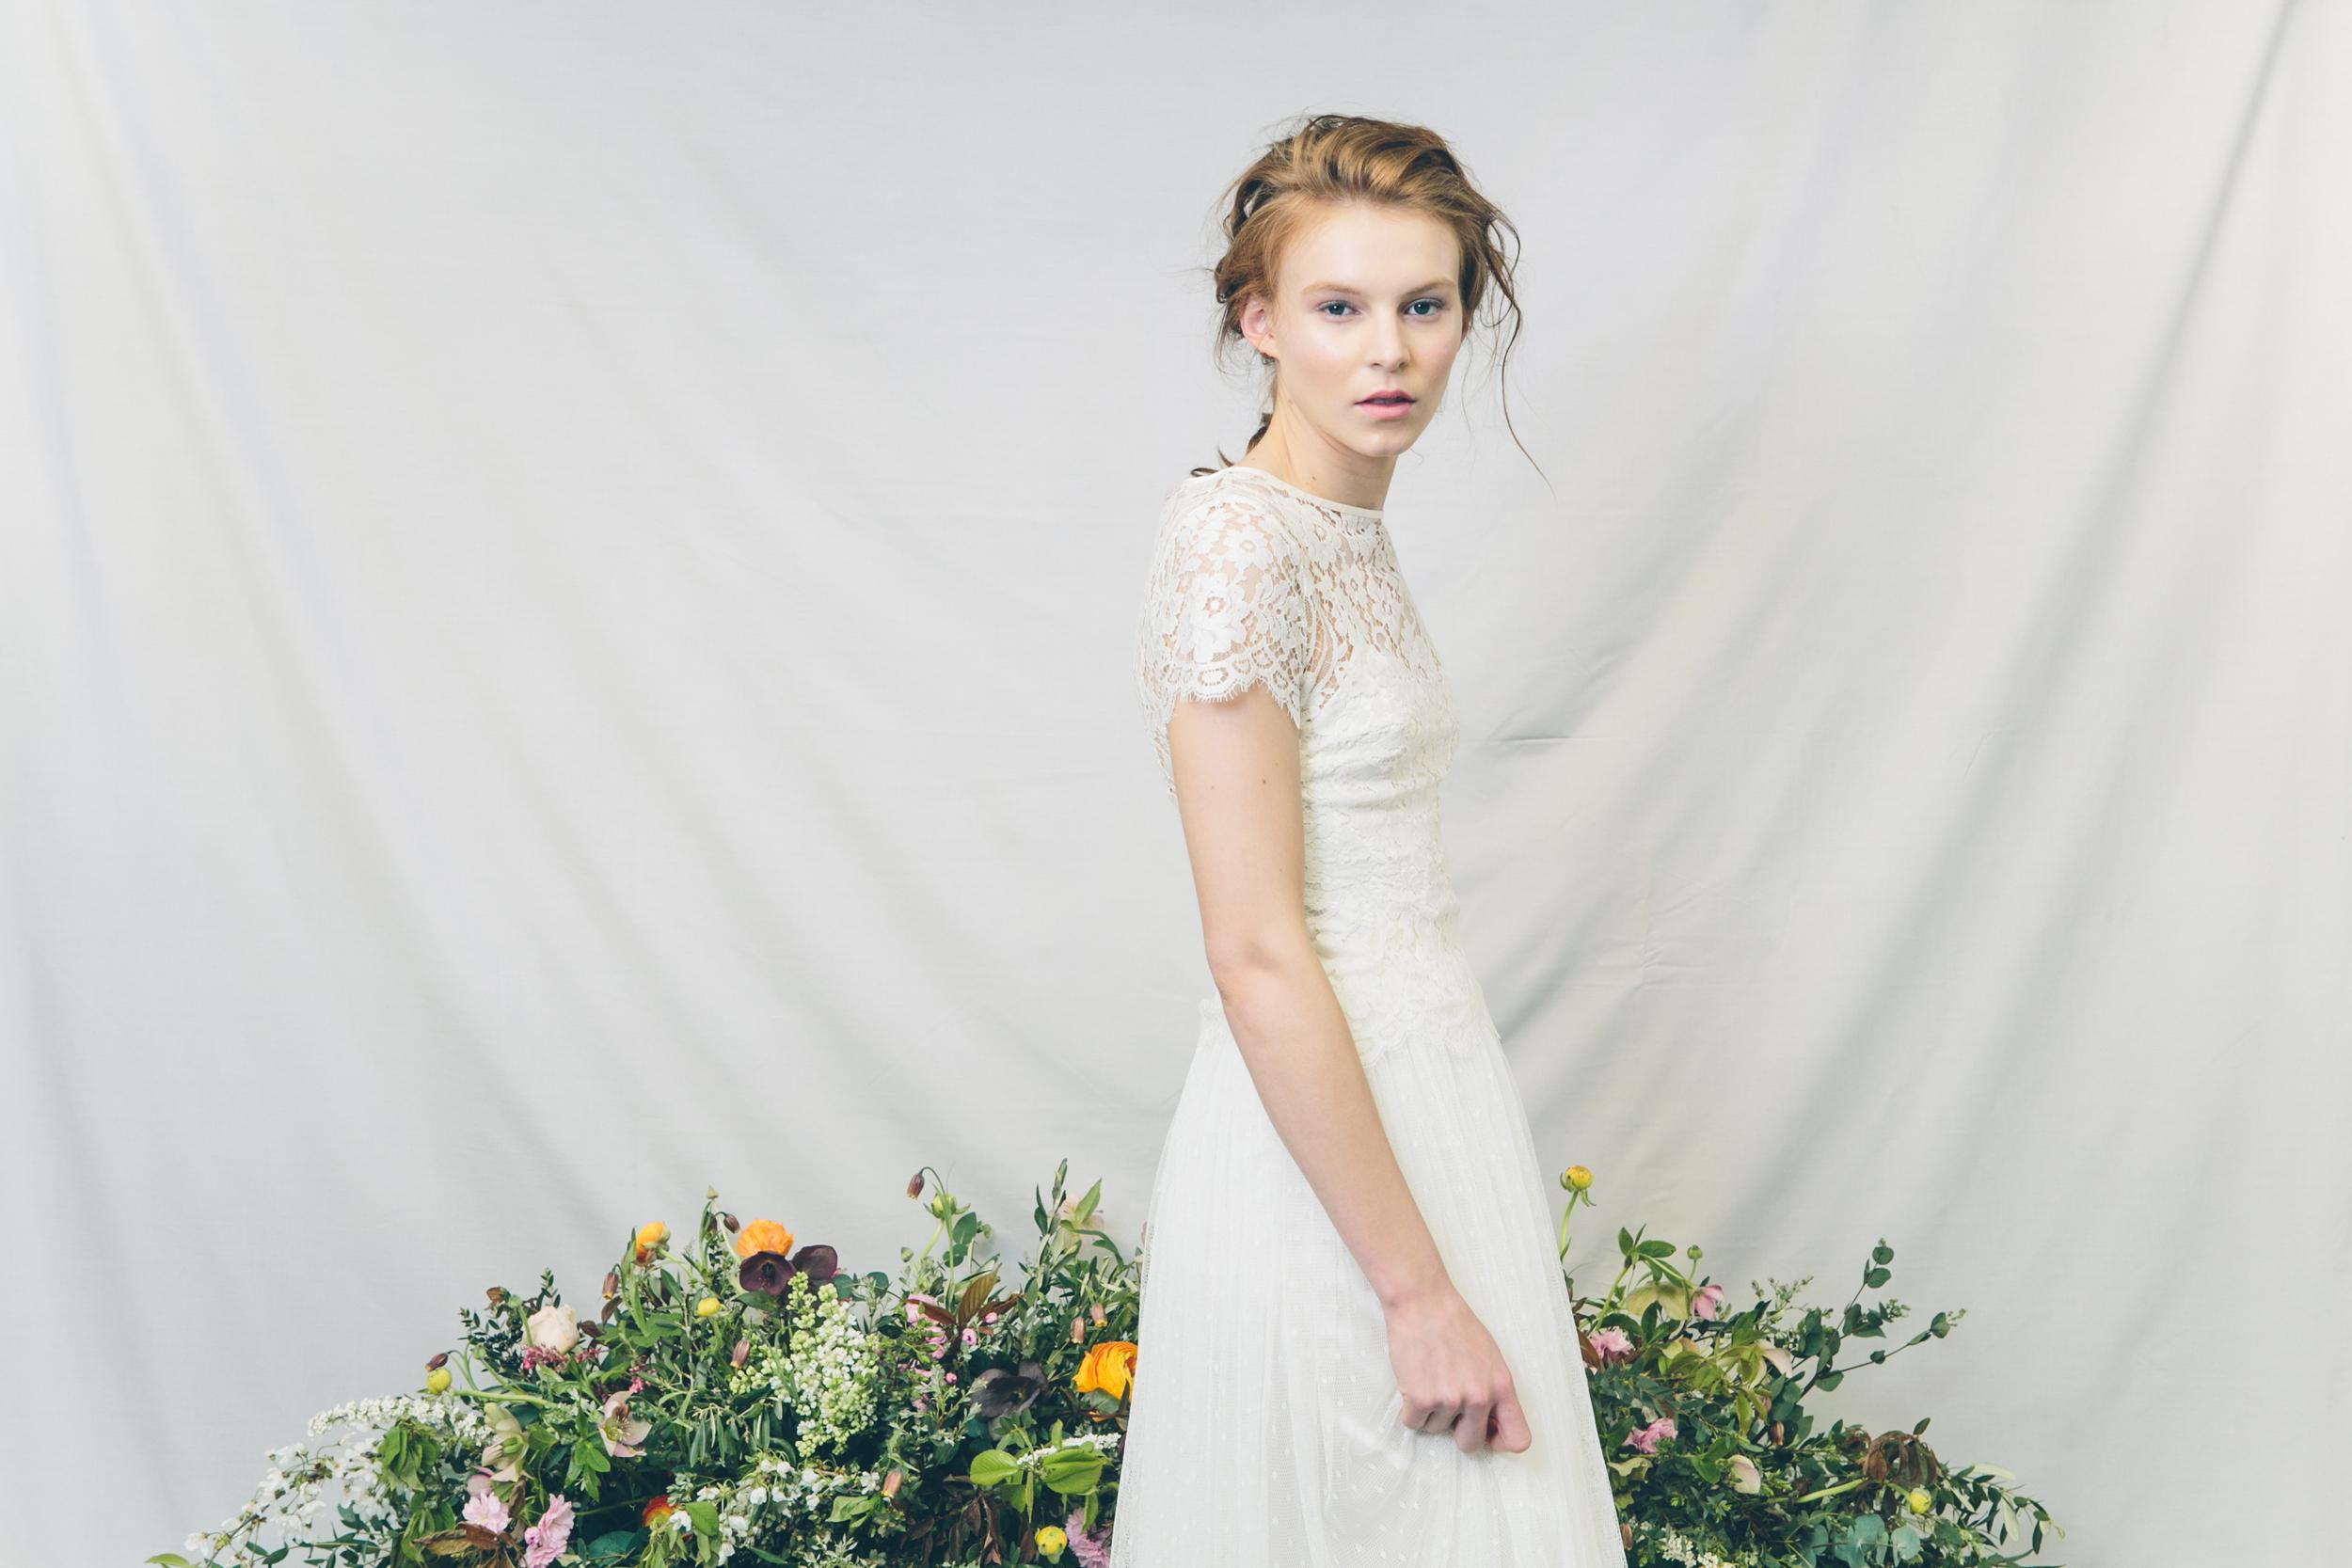 Kate-Beaumont-Wedding-Dresses-Sheffield-16.jpg